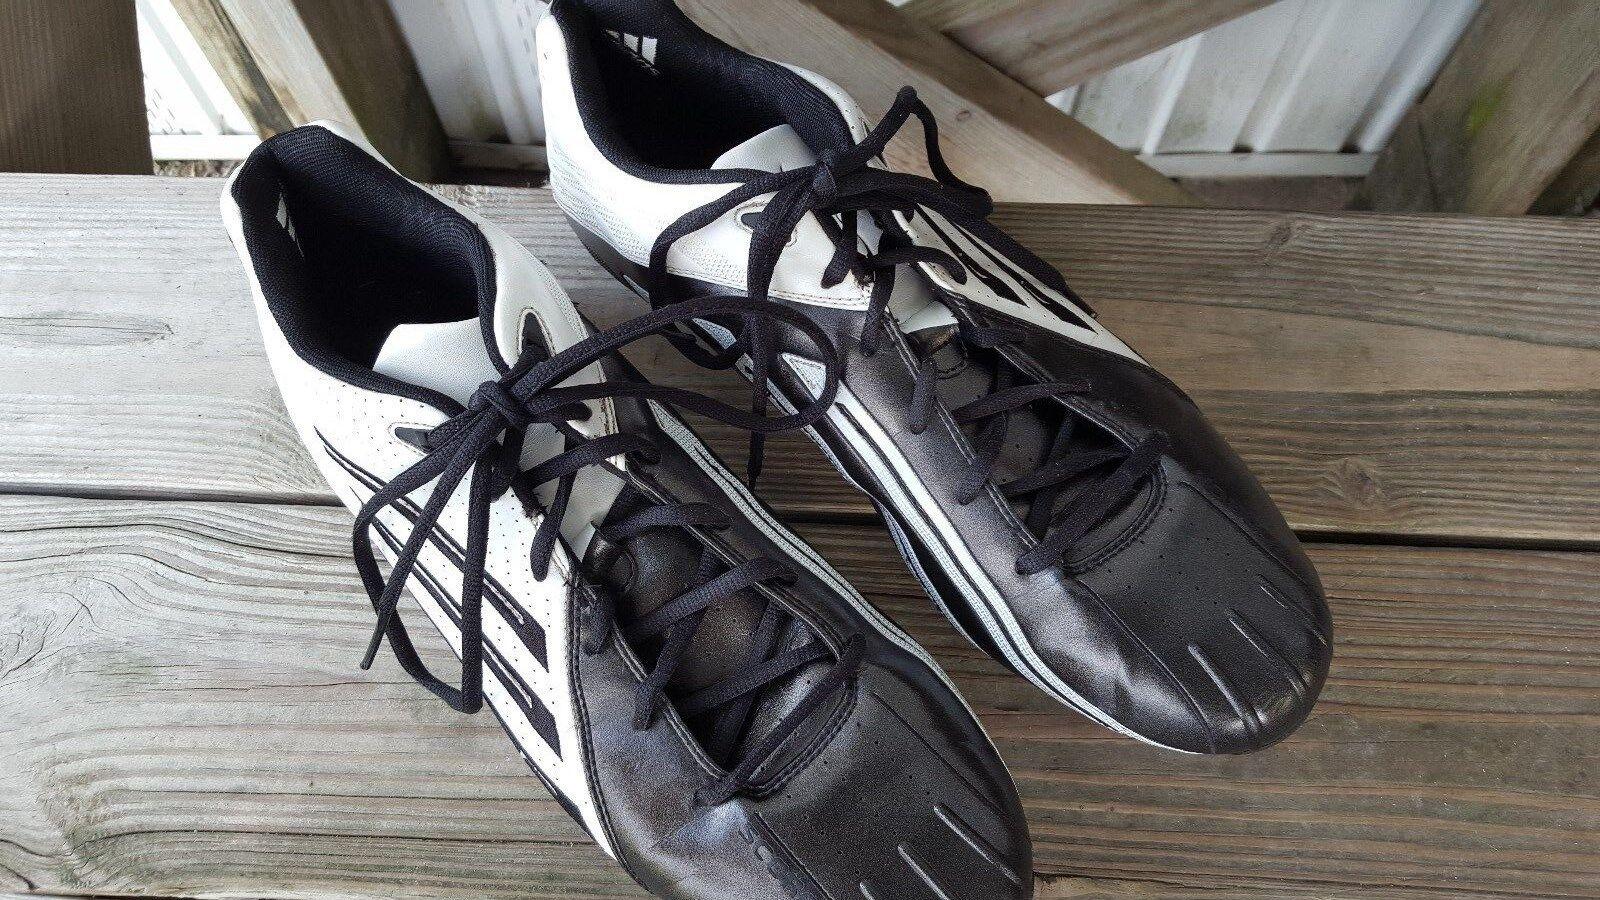 Adidas Scorch Low Football Soccer La Crosse Cleats Black White Men's Comfortable Brand discount